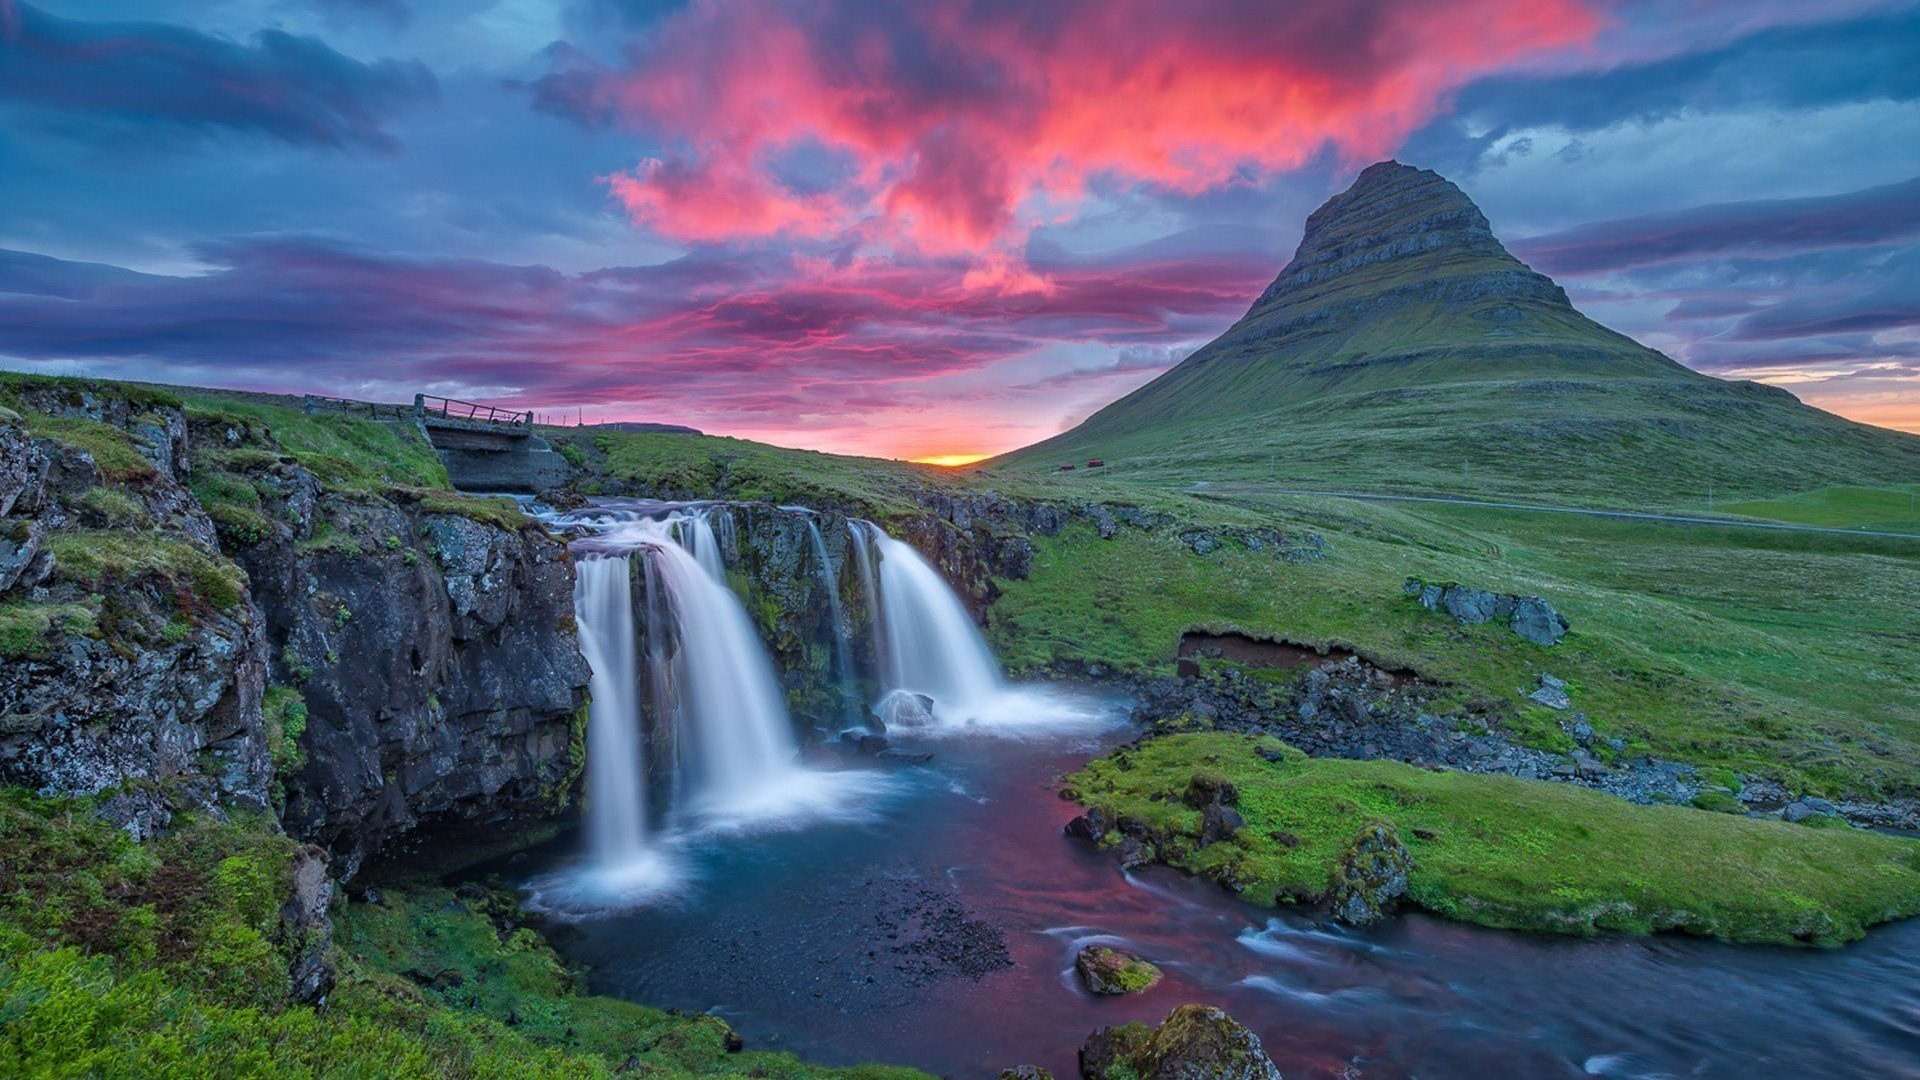 Iceland wallpaper for desktop